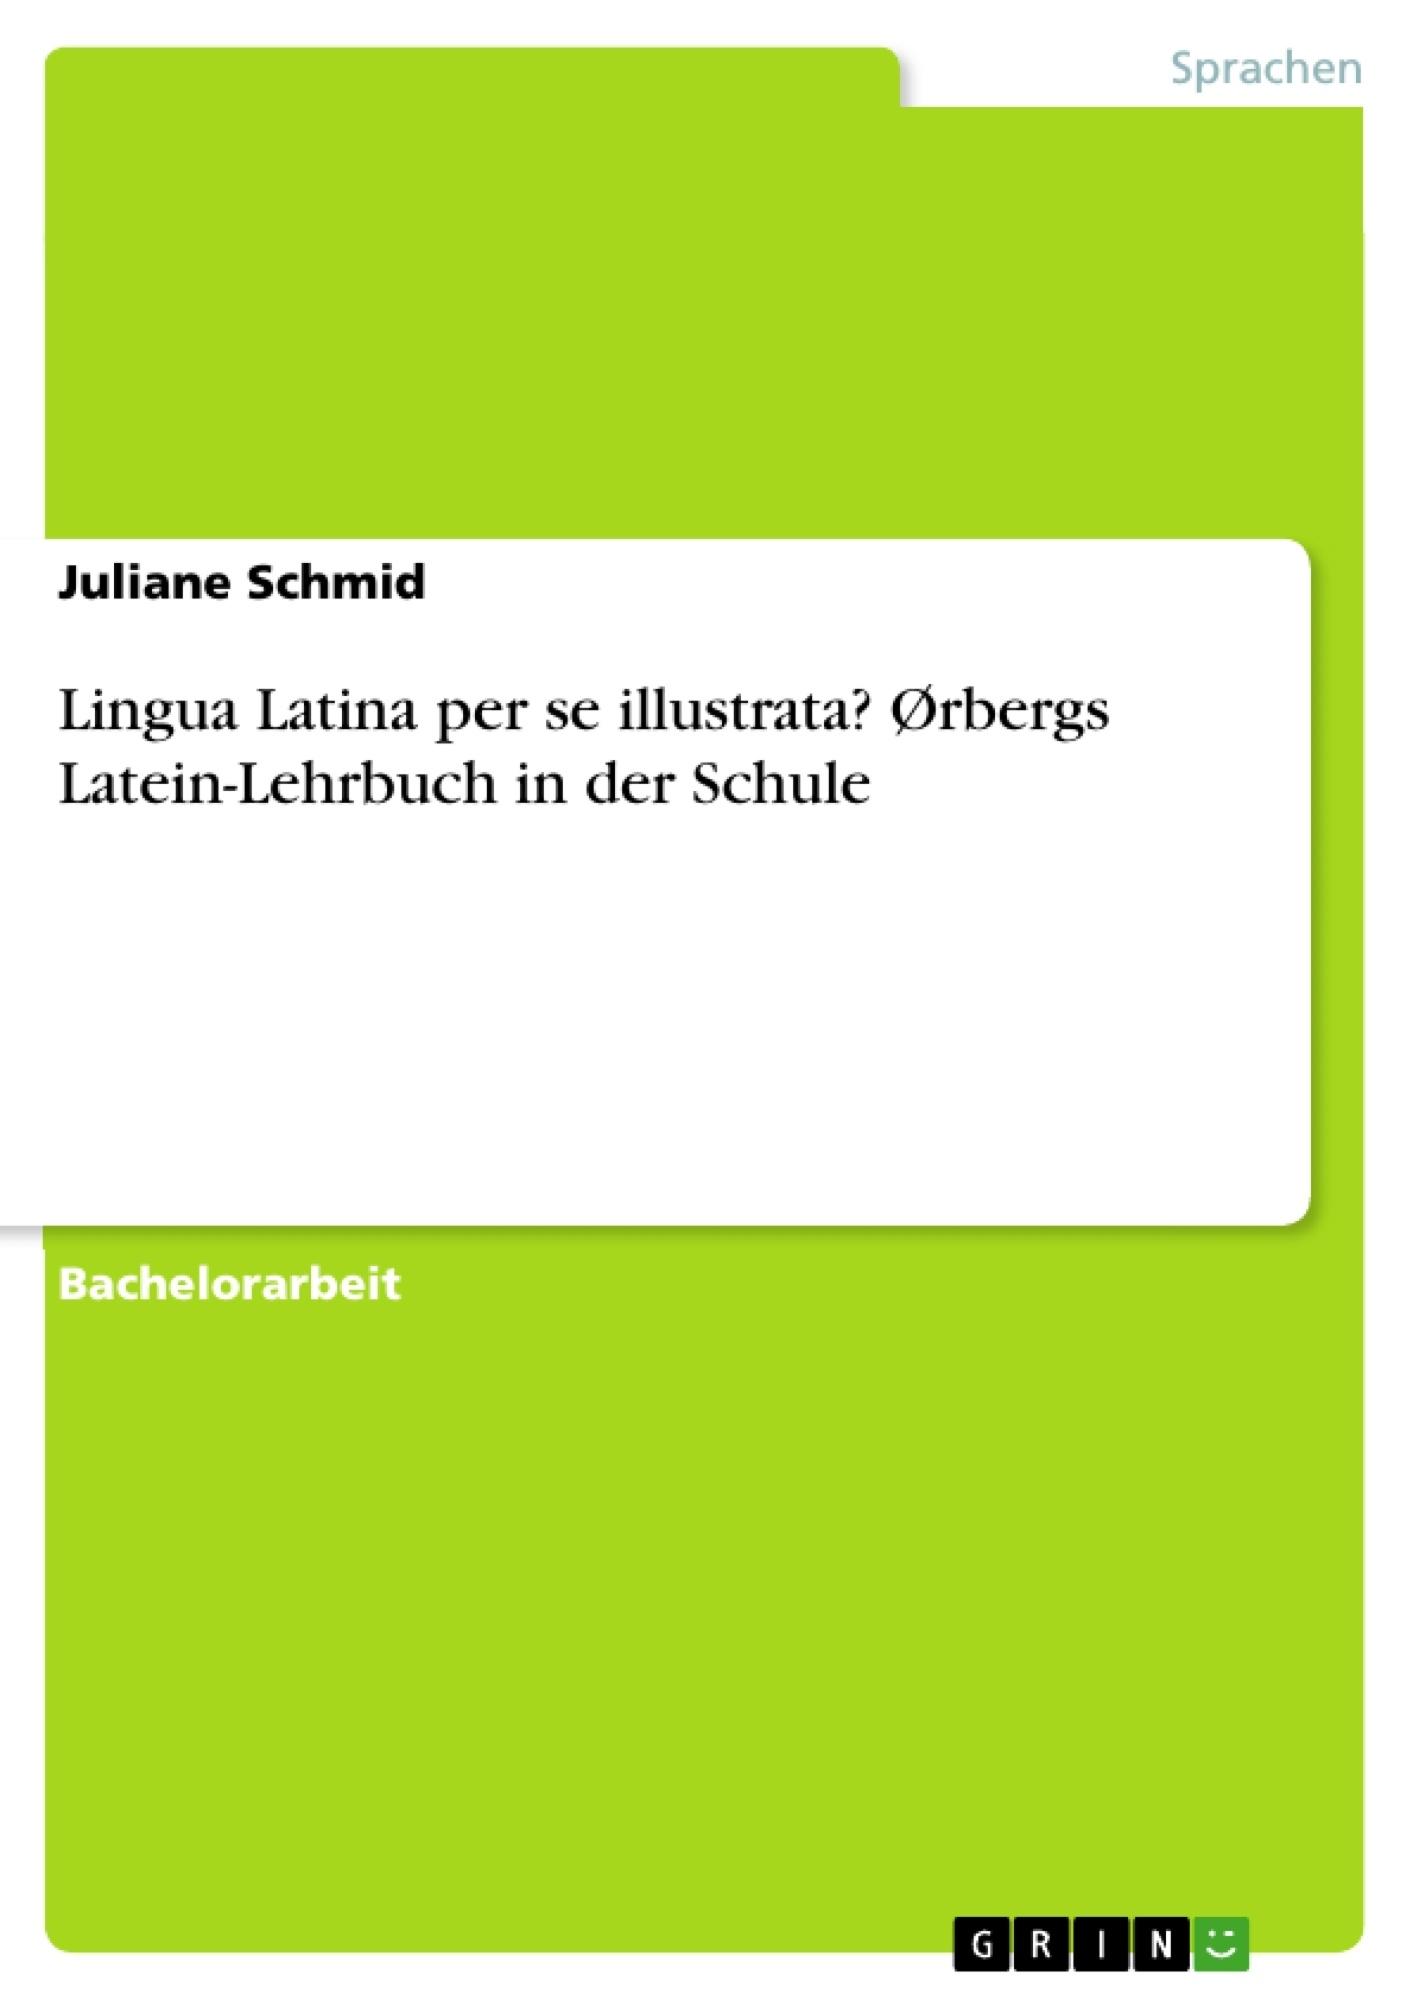 Titel: Lingua Latina per se illustrata? Ørbergs Latein-Lehrbuch in der Schule